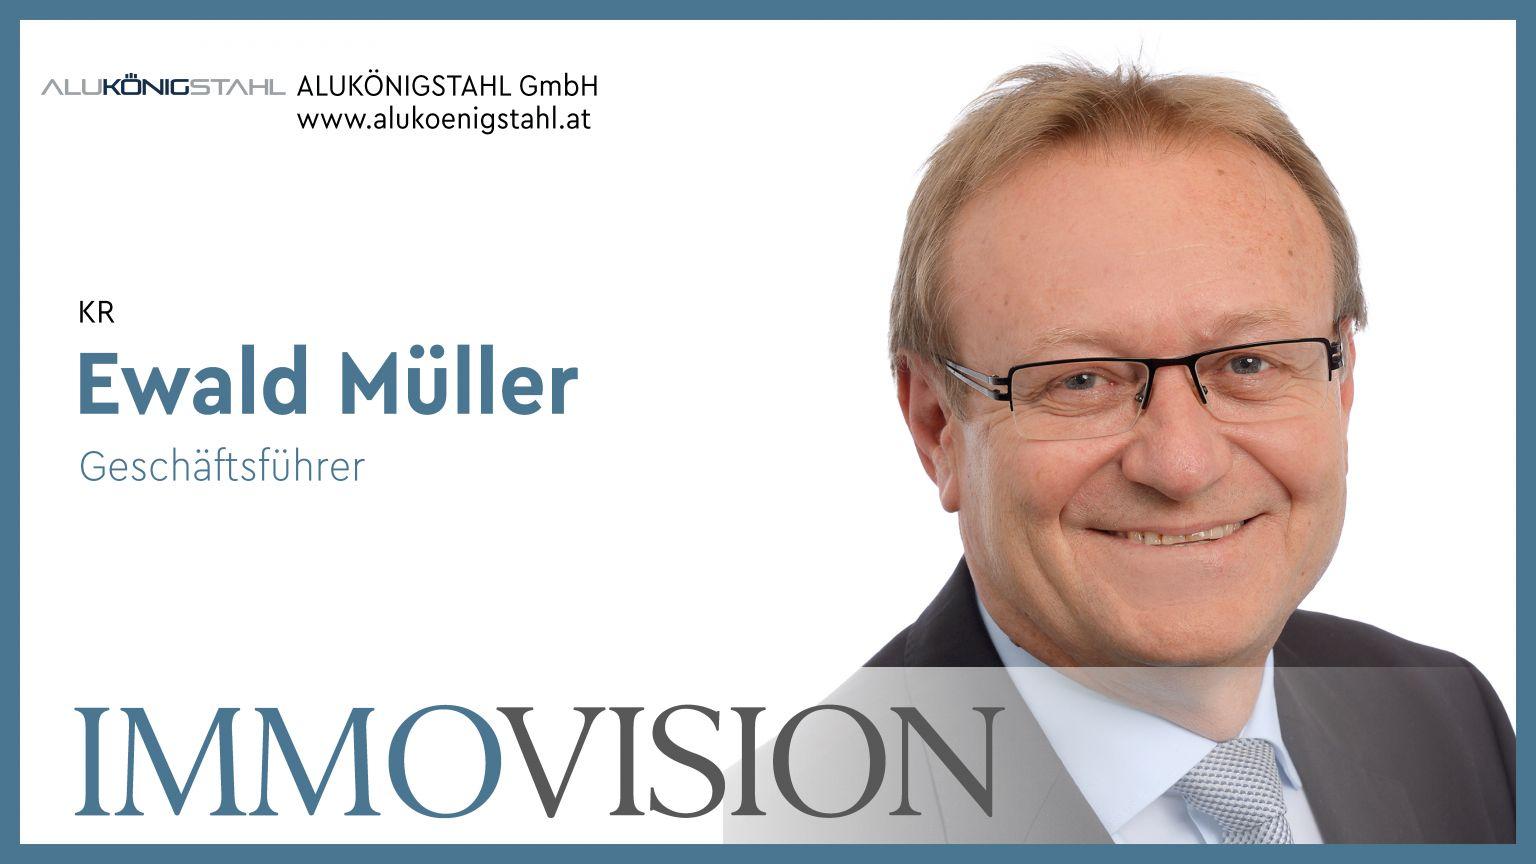 Ewald Müller